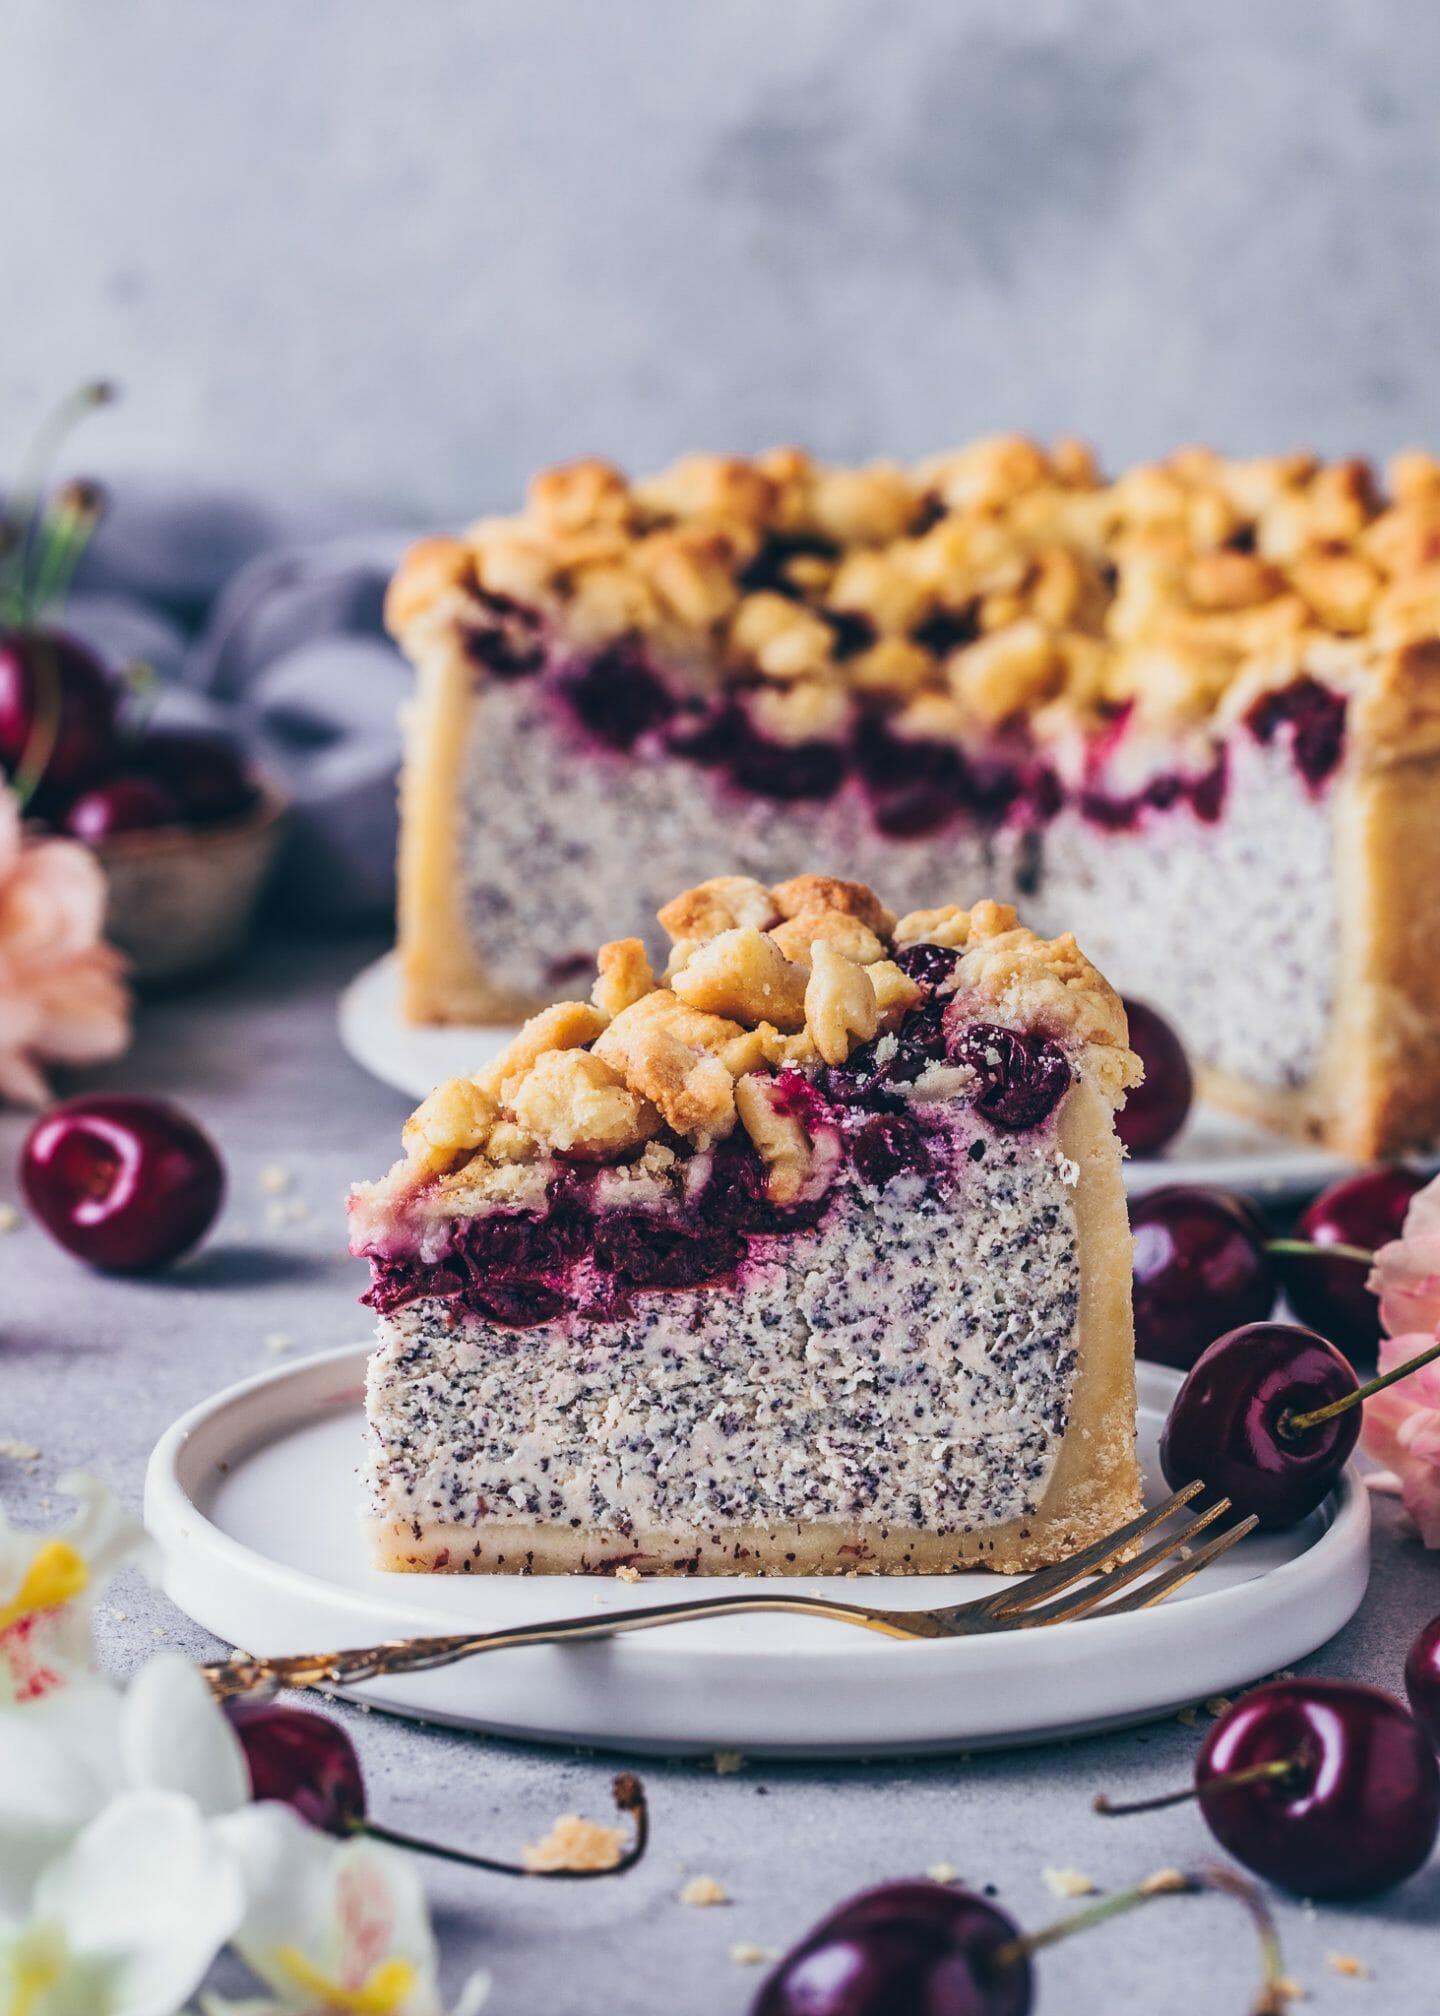 Cherry Crumble Cake vegan Cheesecake with poppy seeds